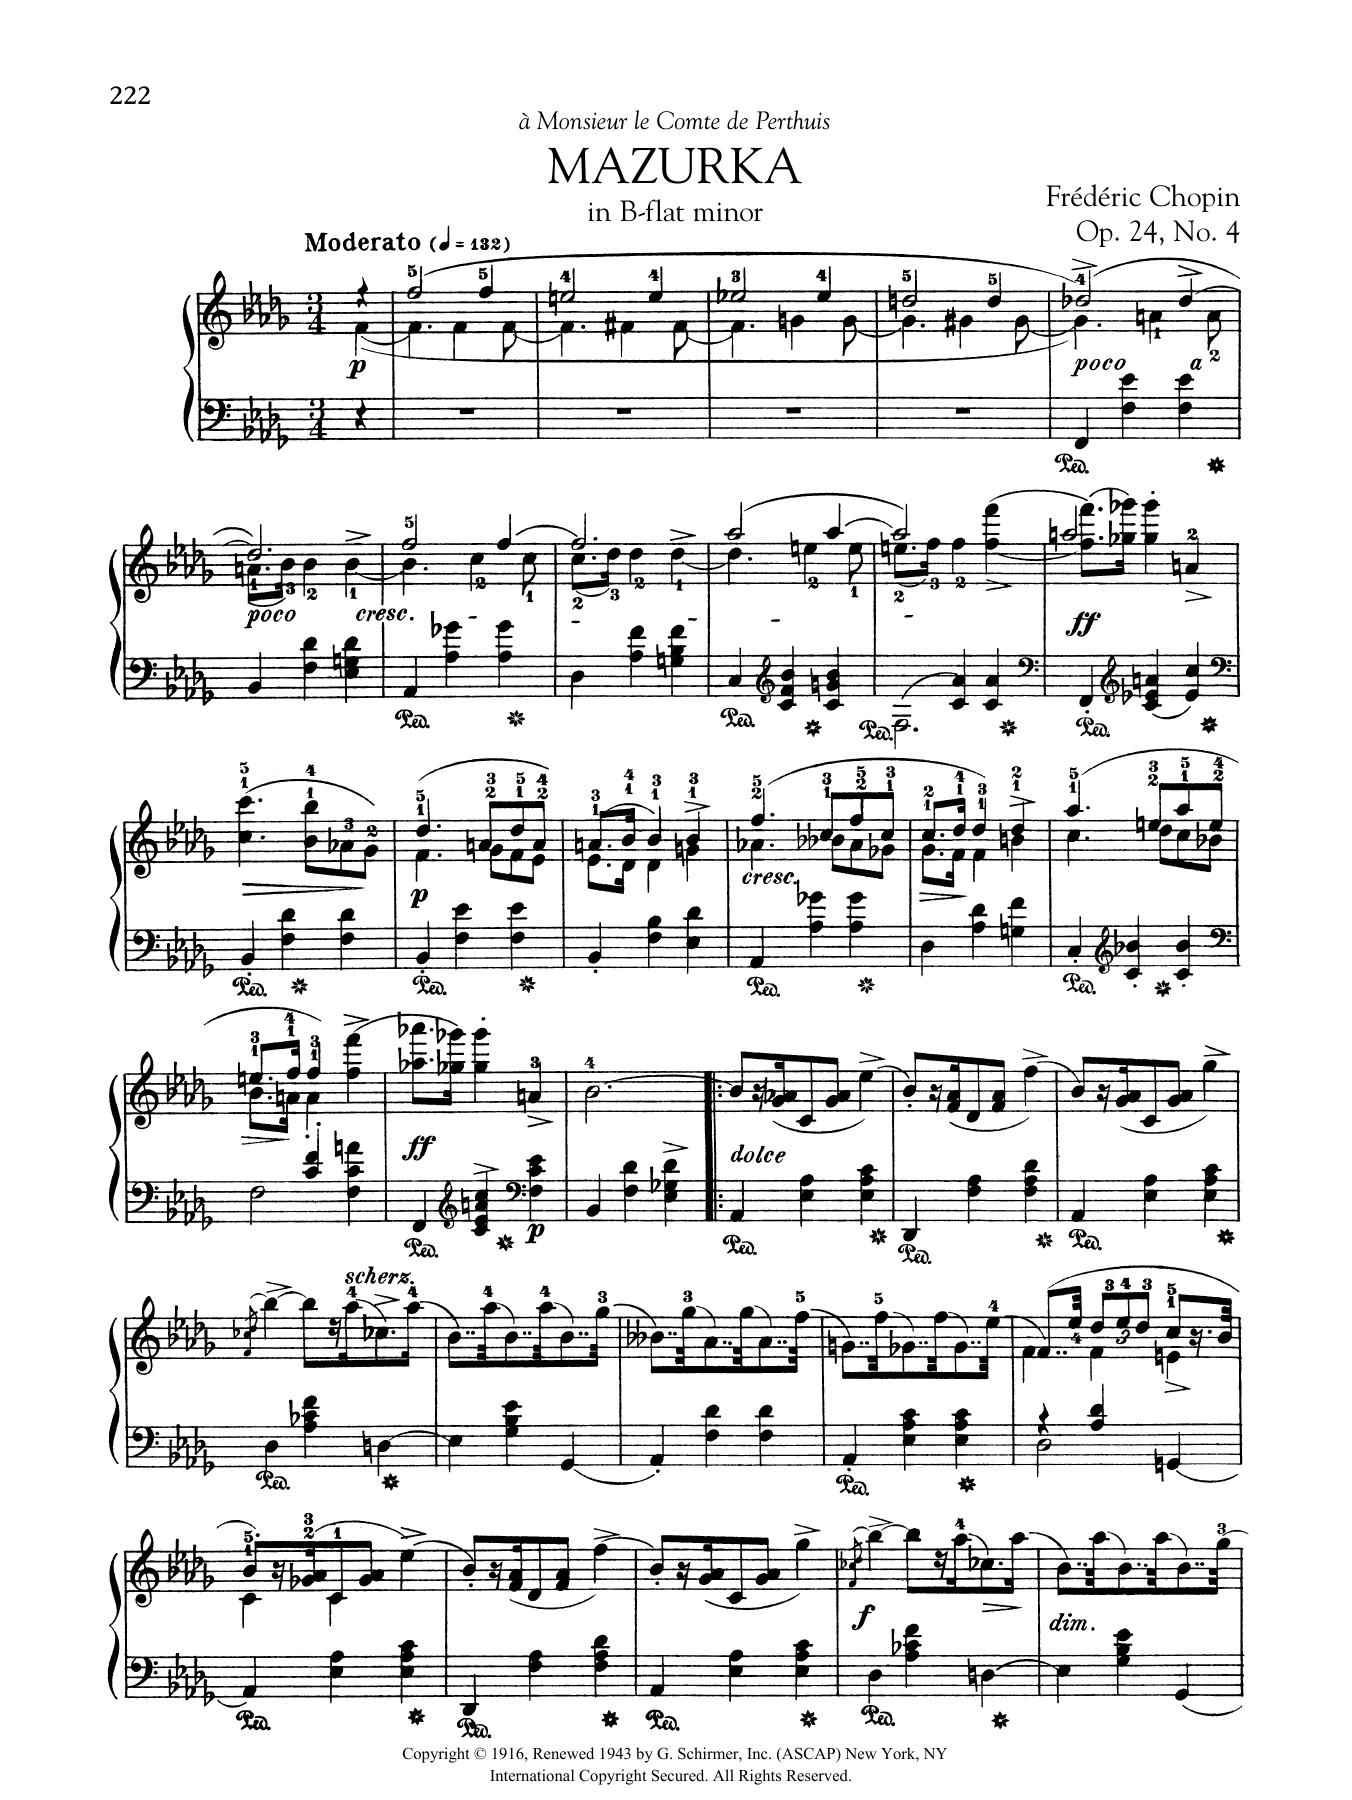 Mazurka in B-flat minor, Op. 24, No. 4 Sheet Music